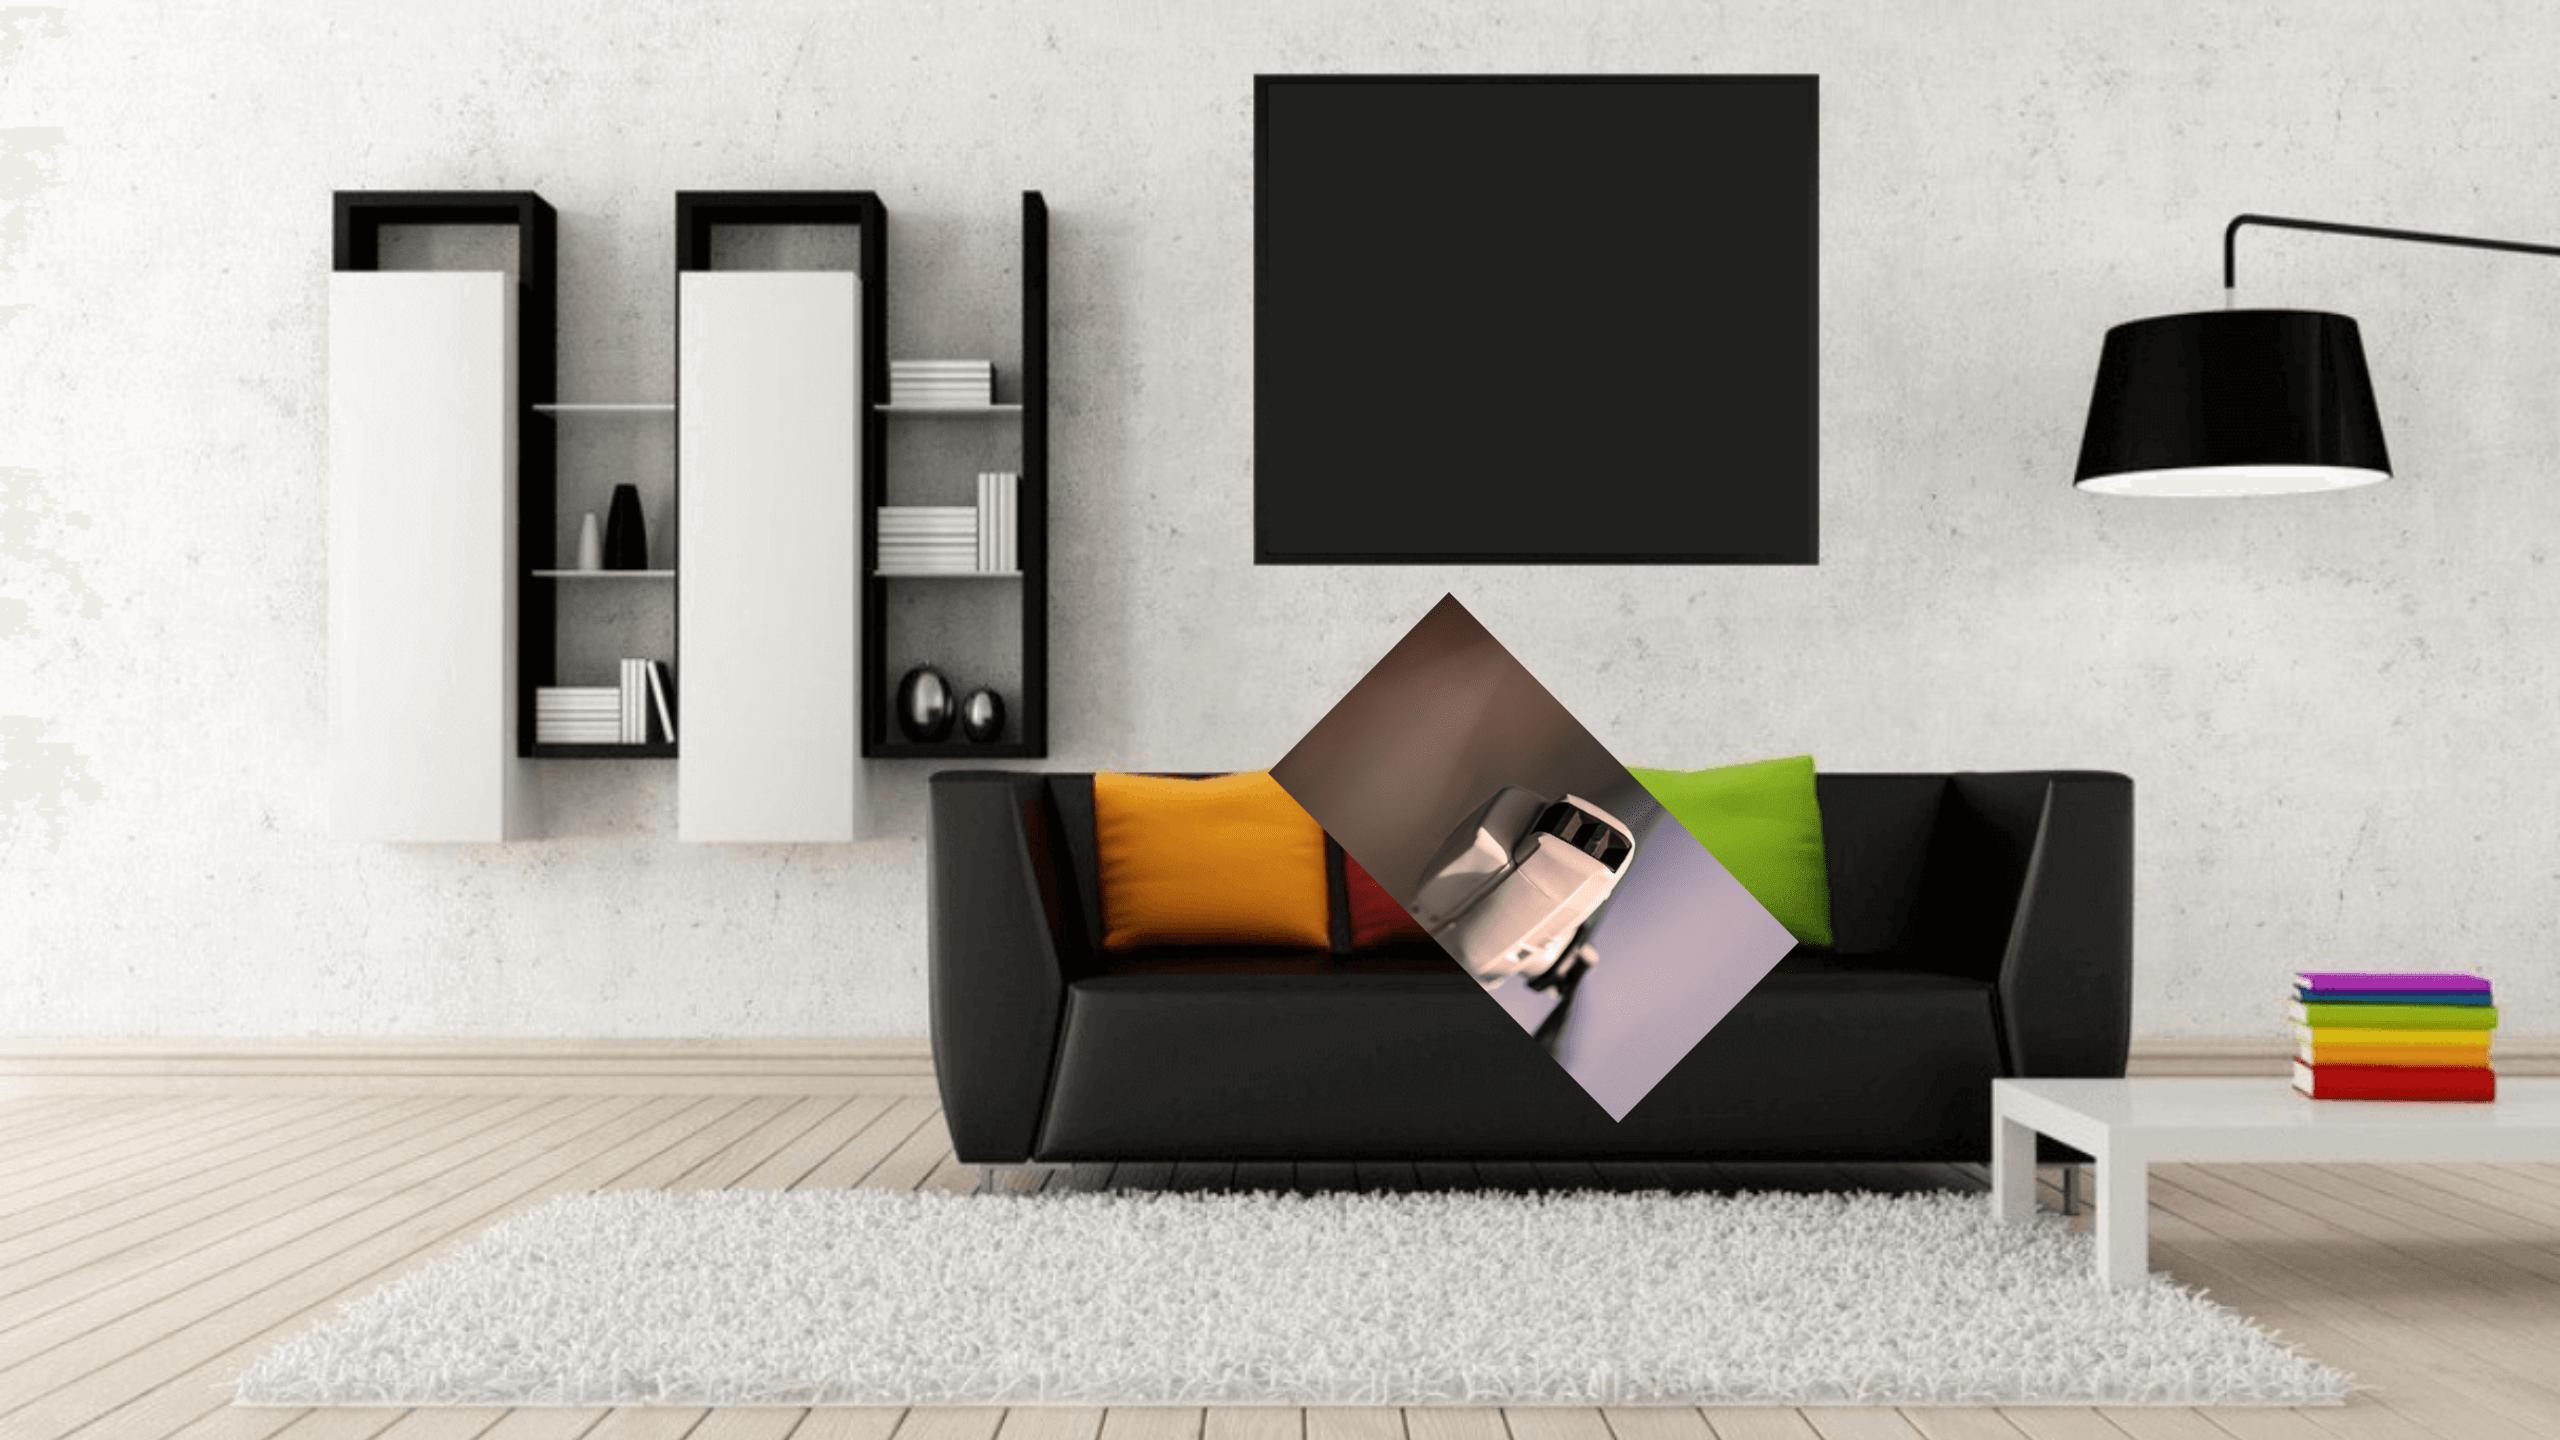 Furniture Product Interior Design Living ... & mockup #inspiration #life #photo Design - Customize u0026 Download it ...